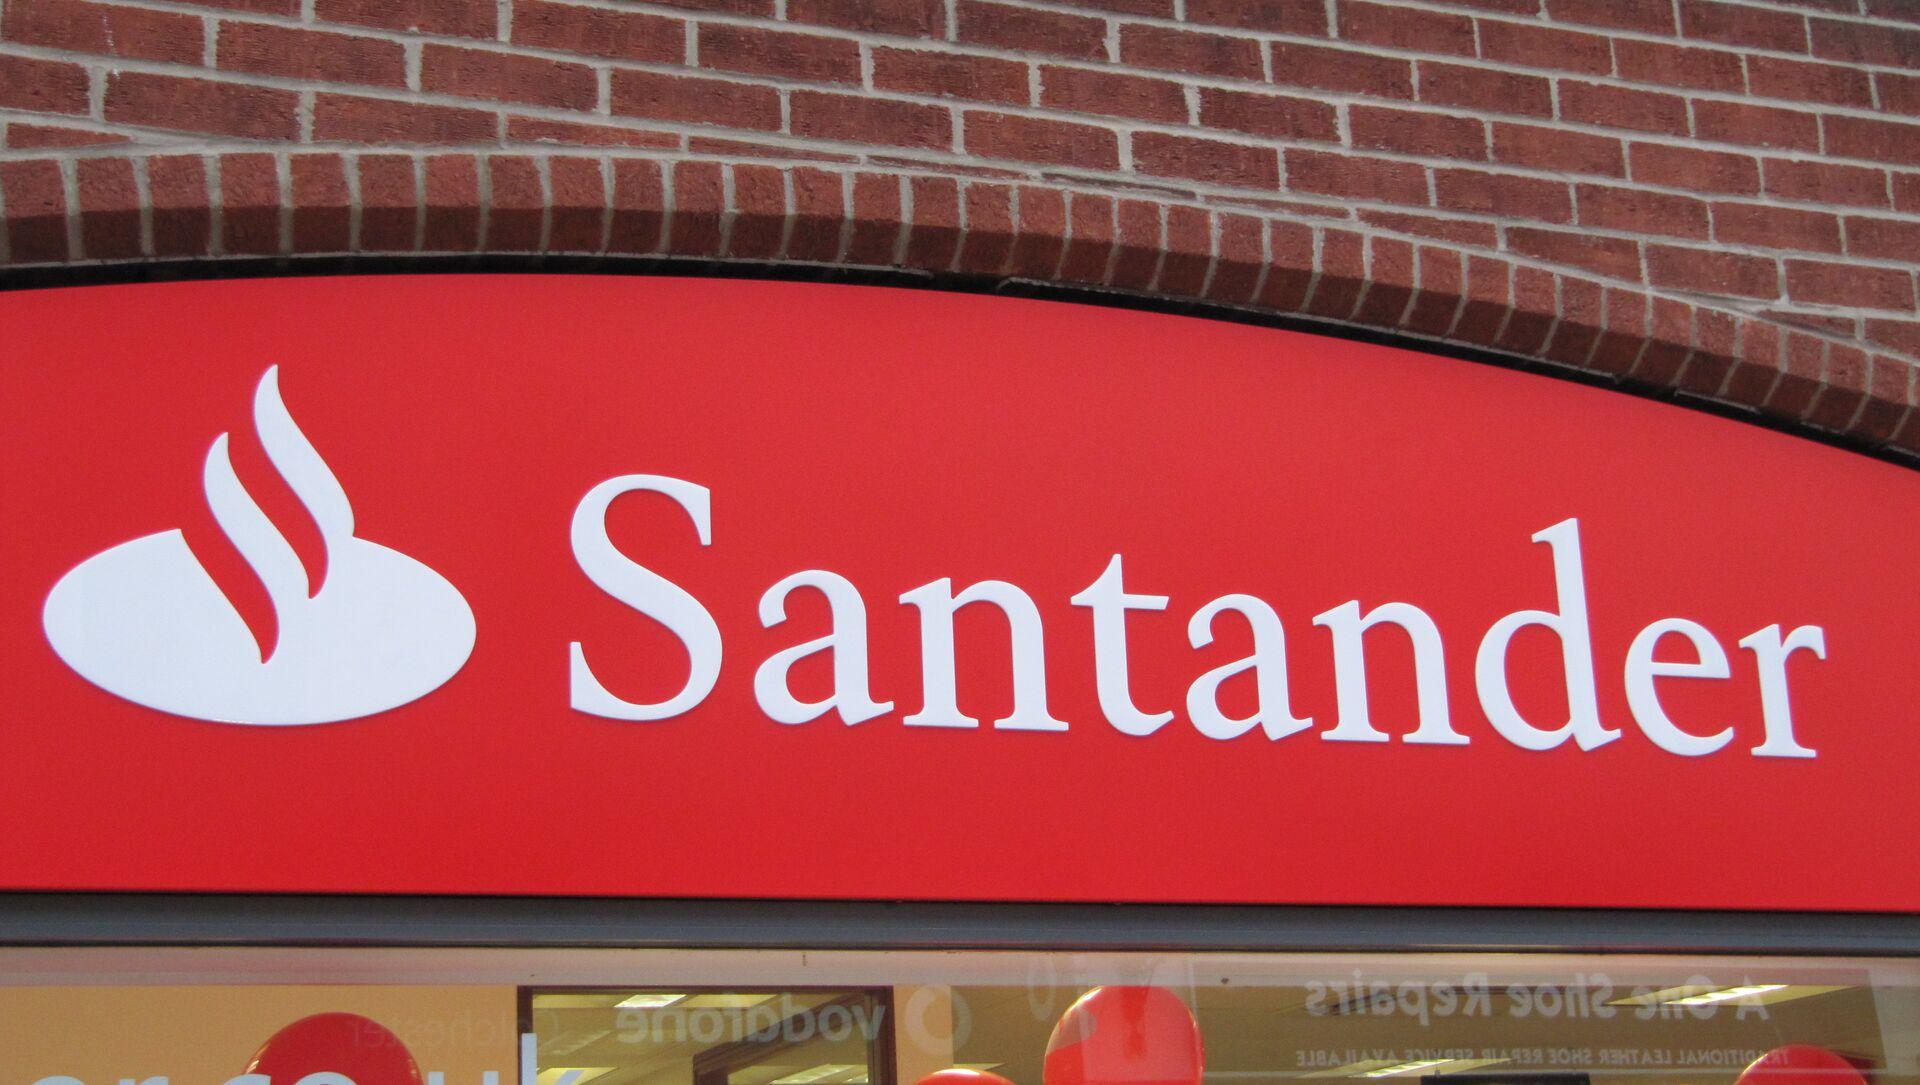 Logo del Banco Santander - Sputnik Mundo, 1920, 02.11.2020